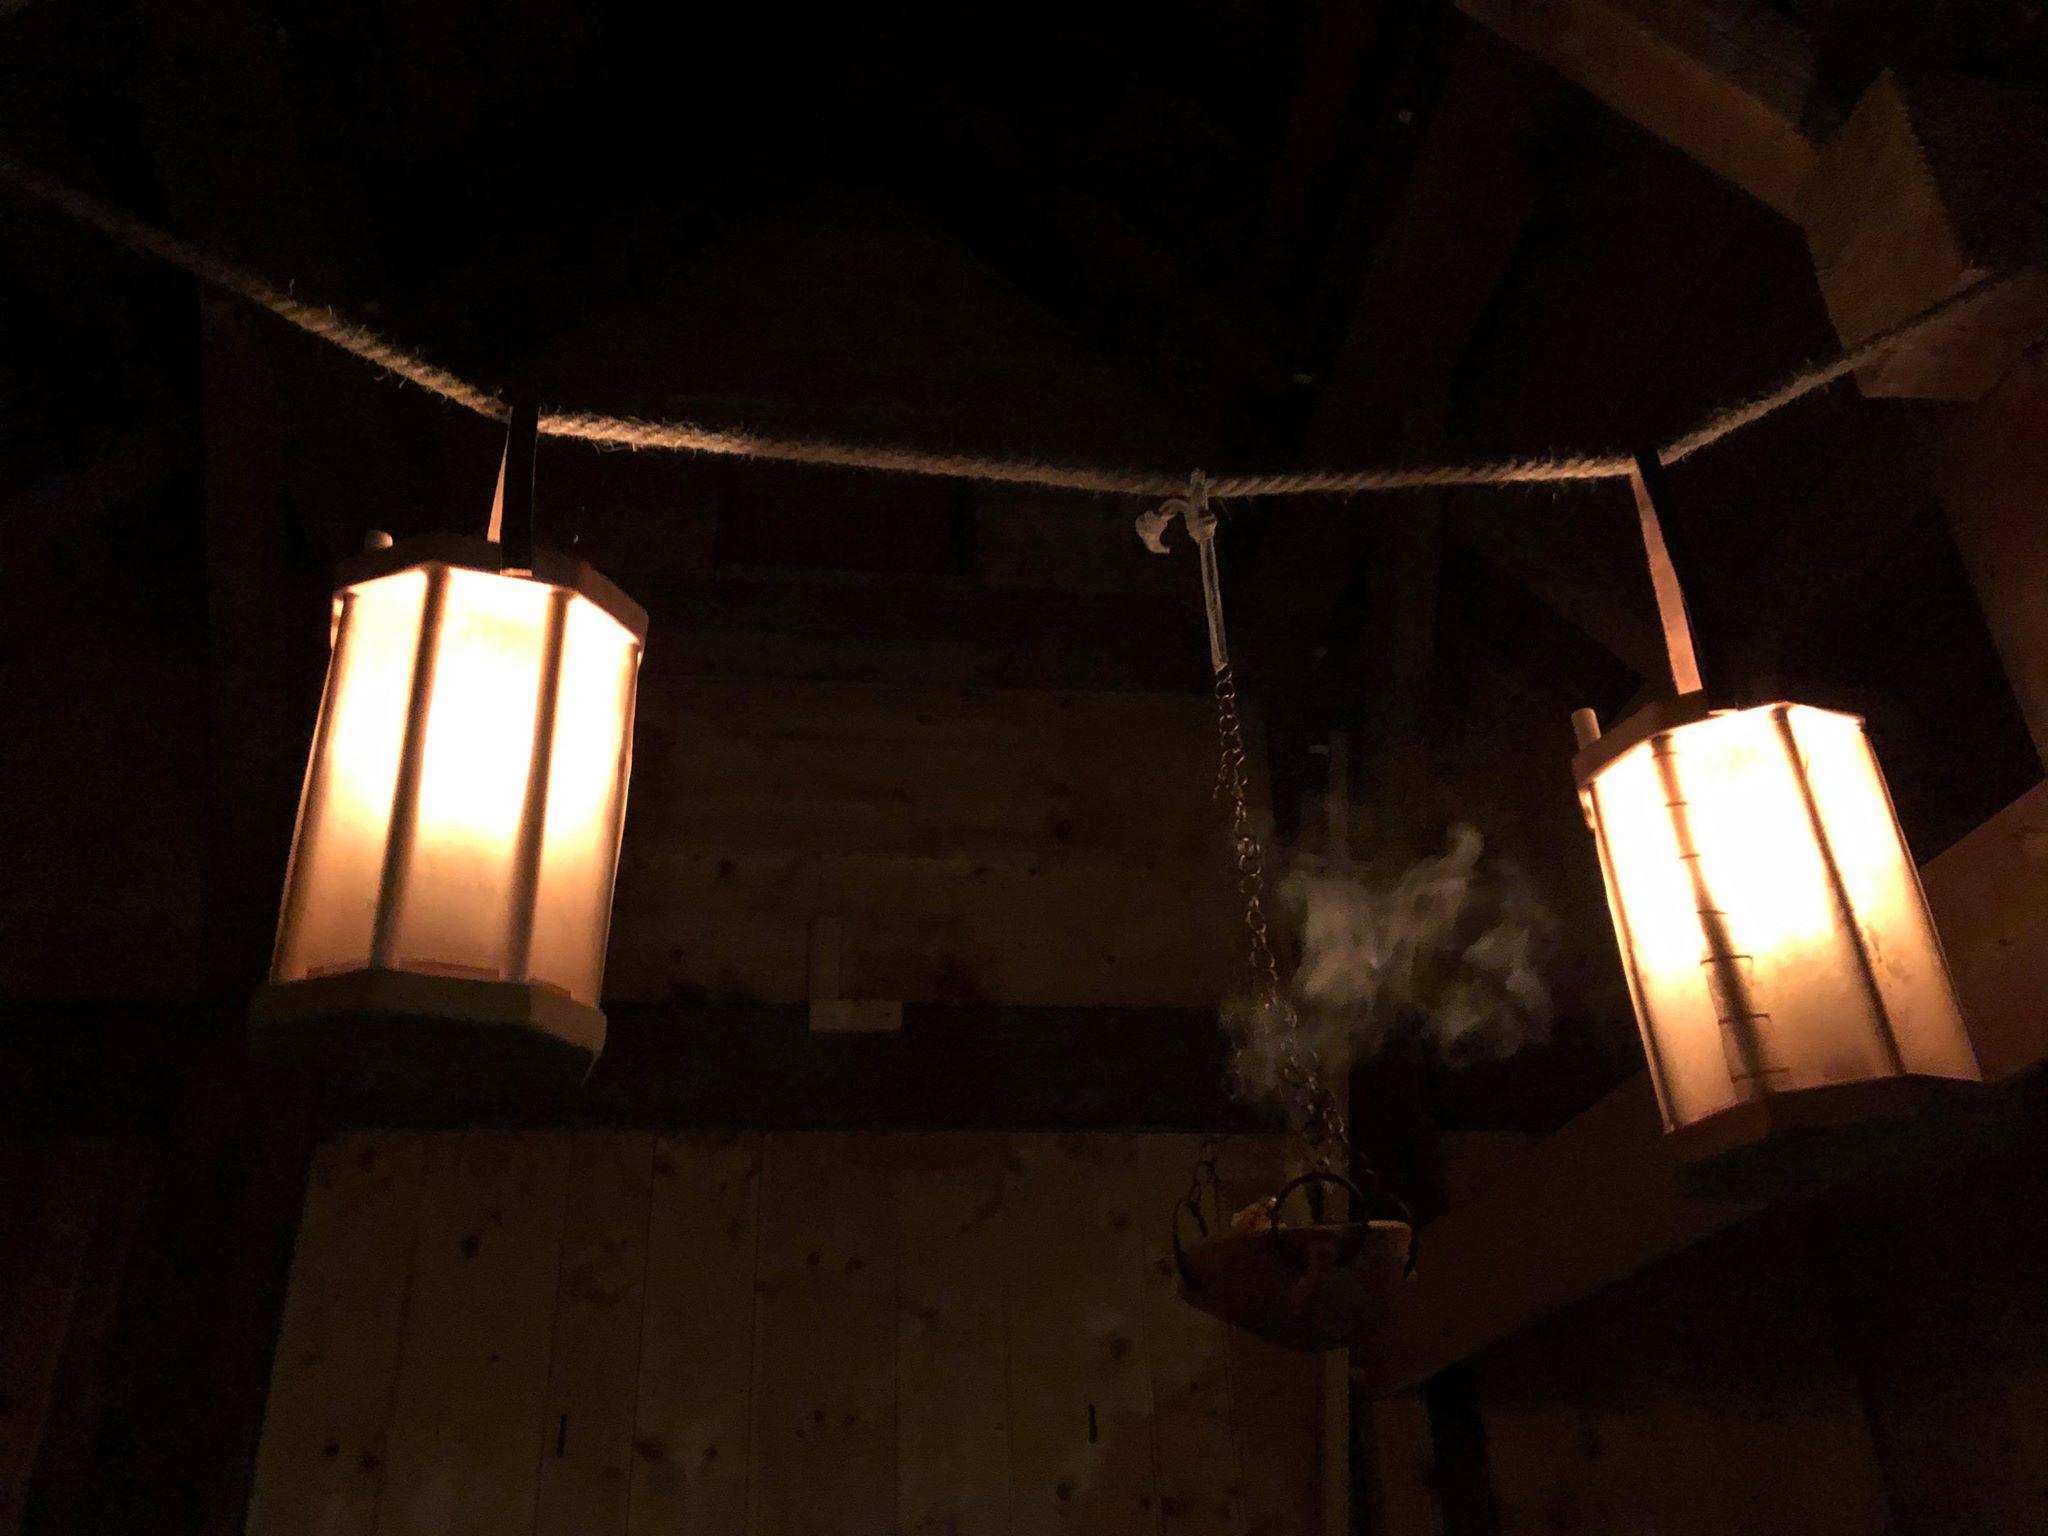 incense and lanterns 02